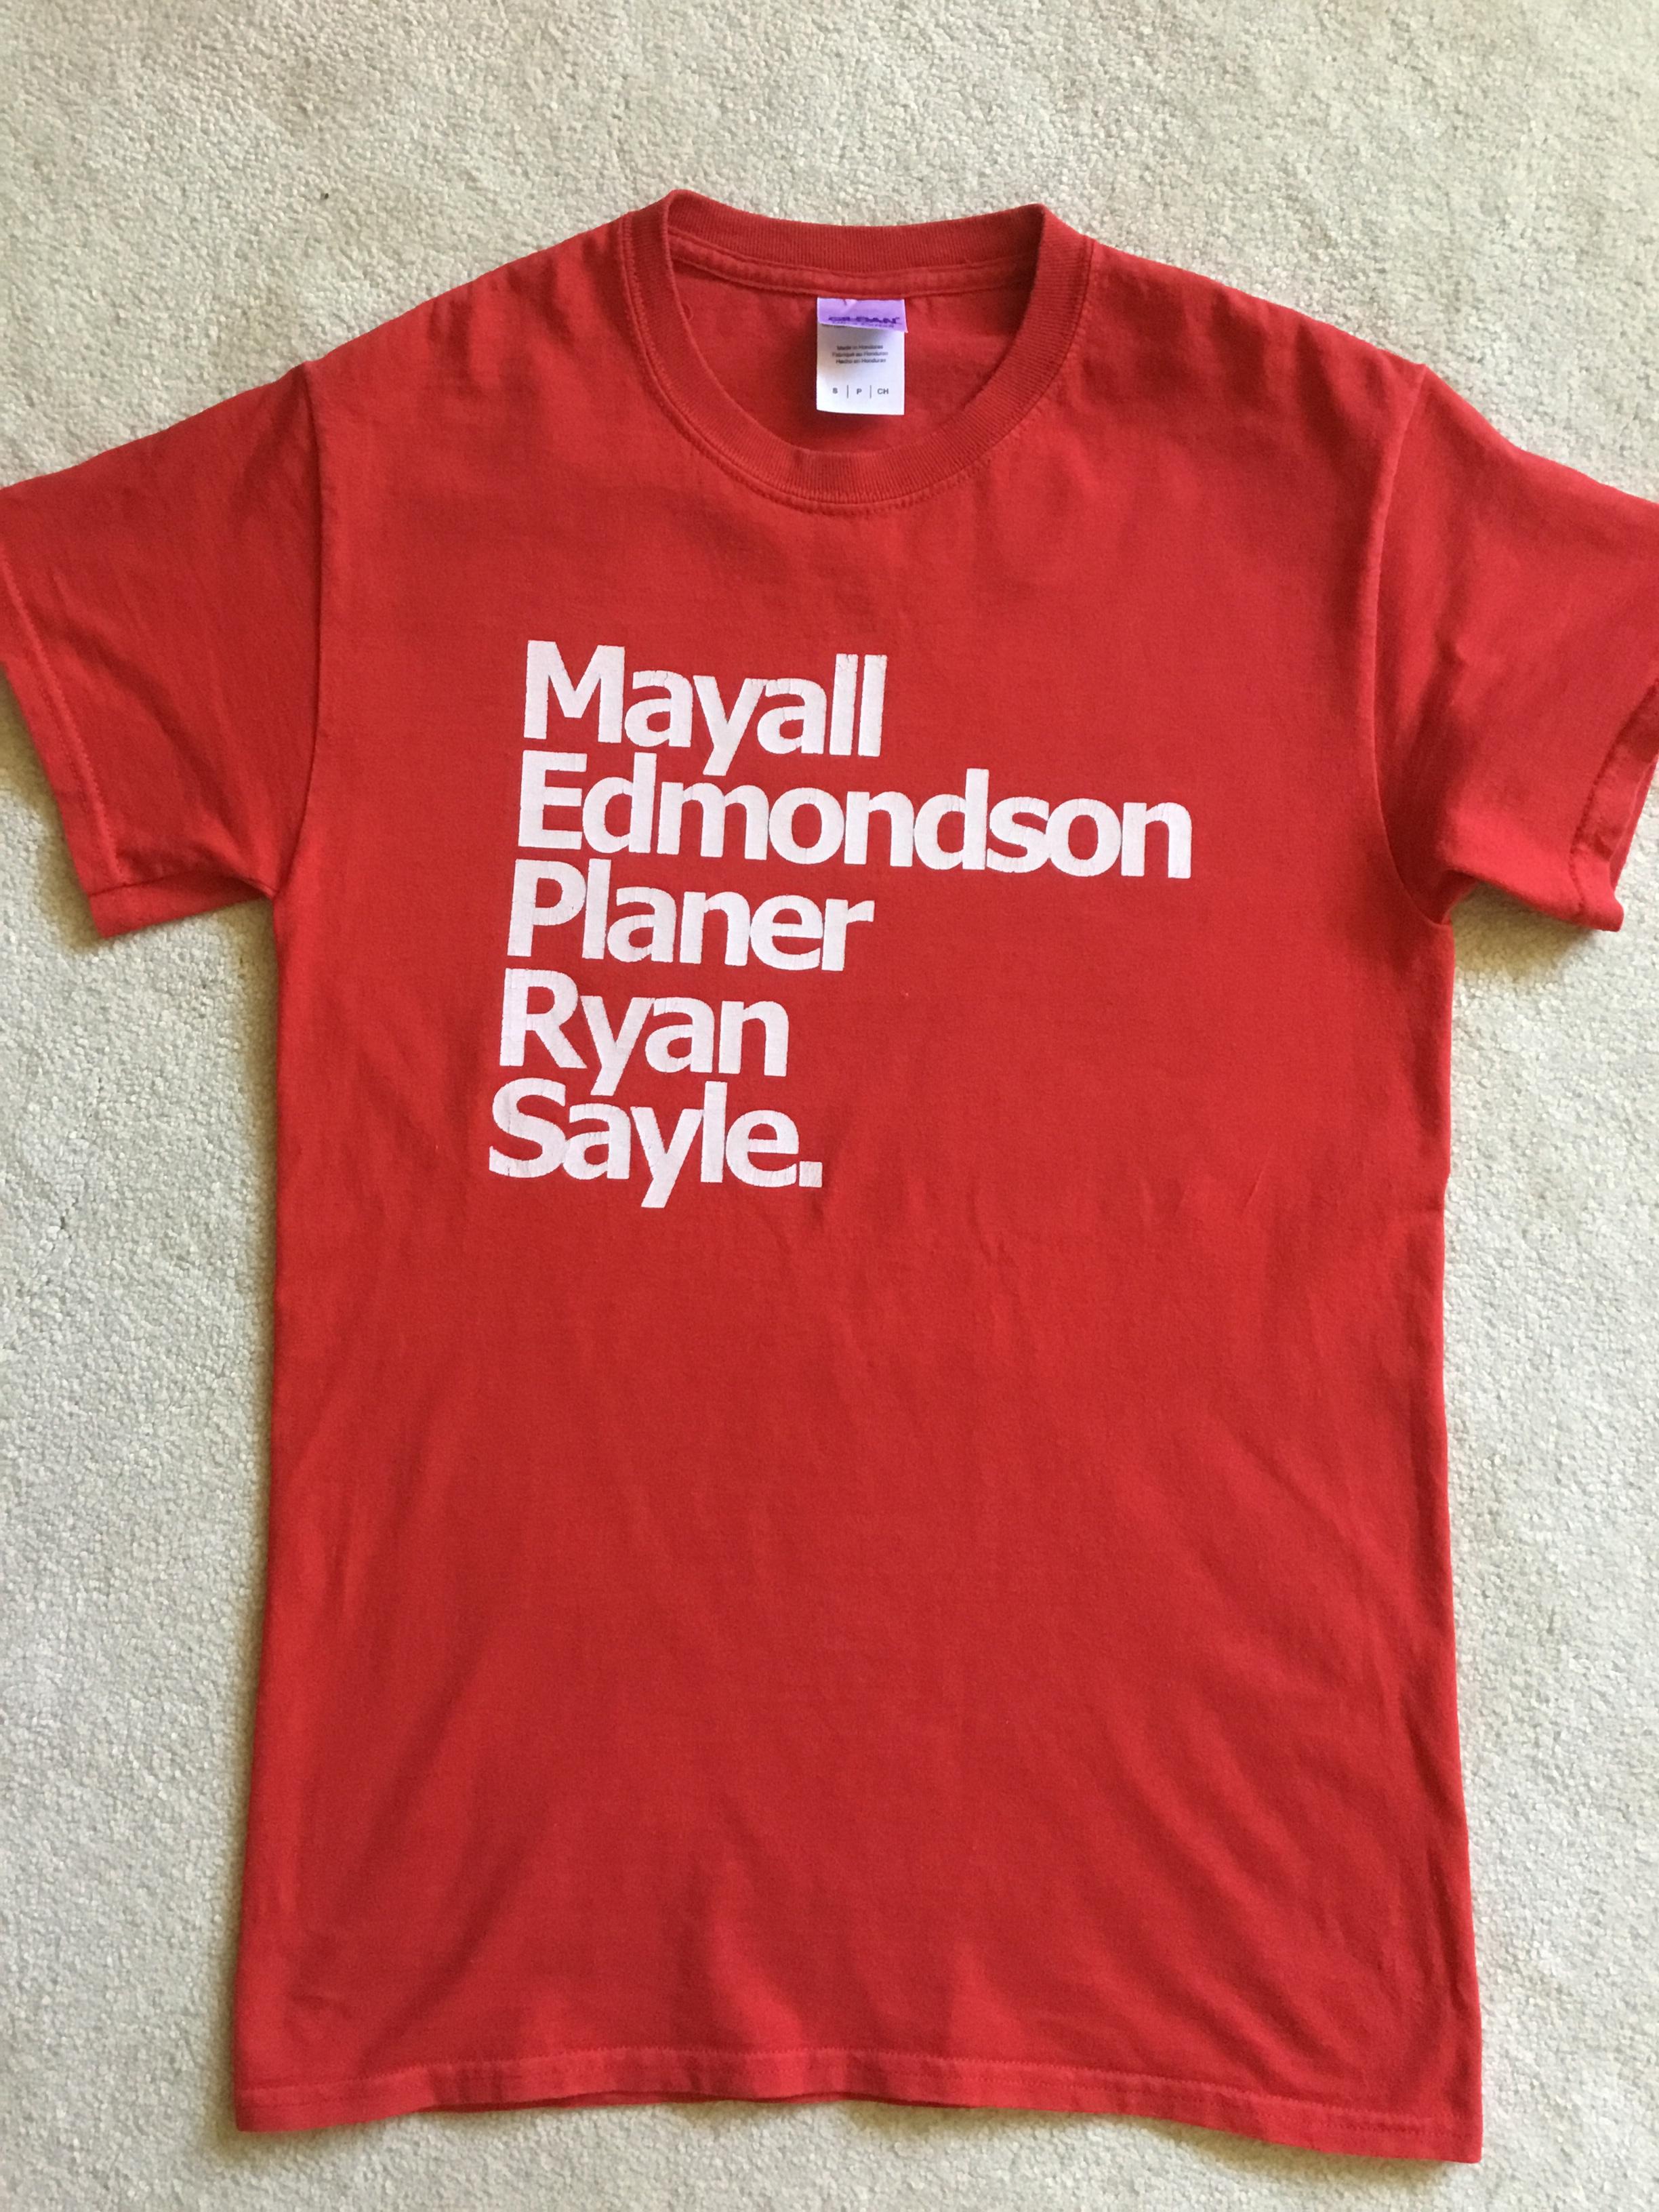 T-Shirts, Mayall, Edmondson, Planer, Ryan, Sayle.